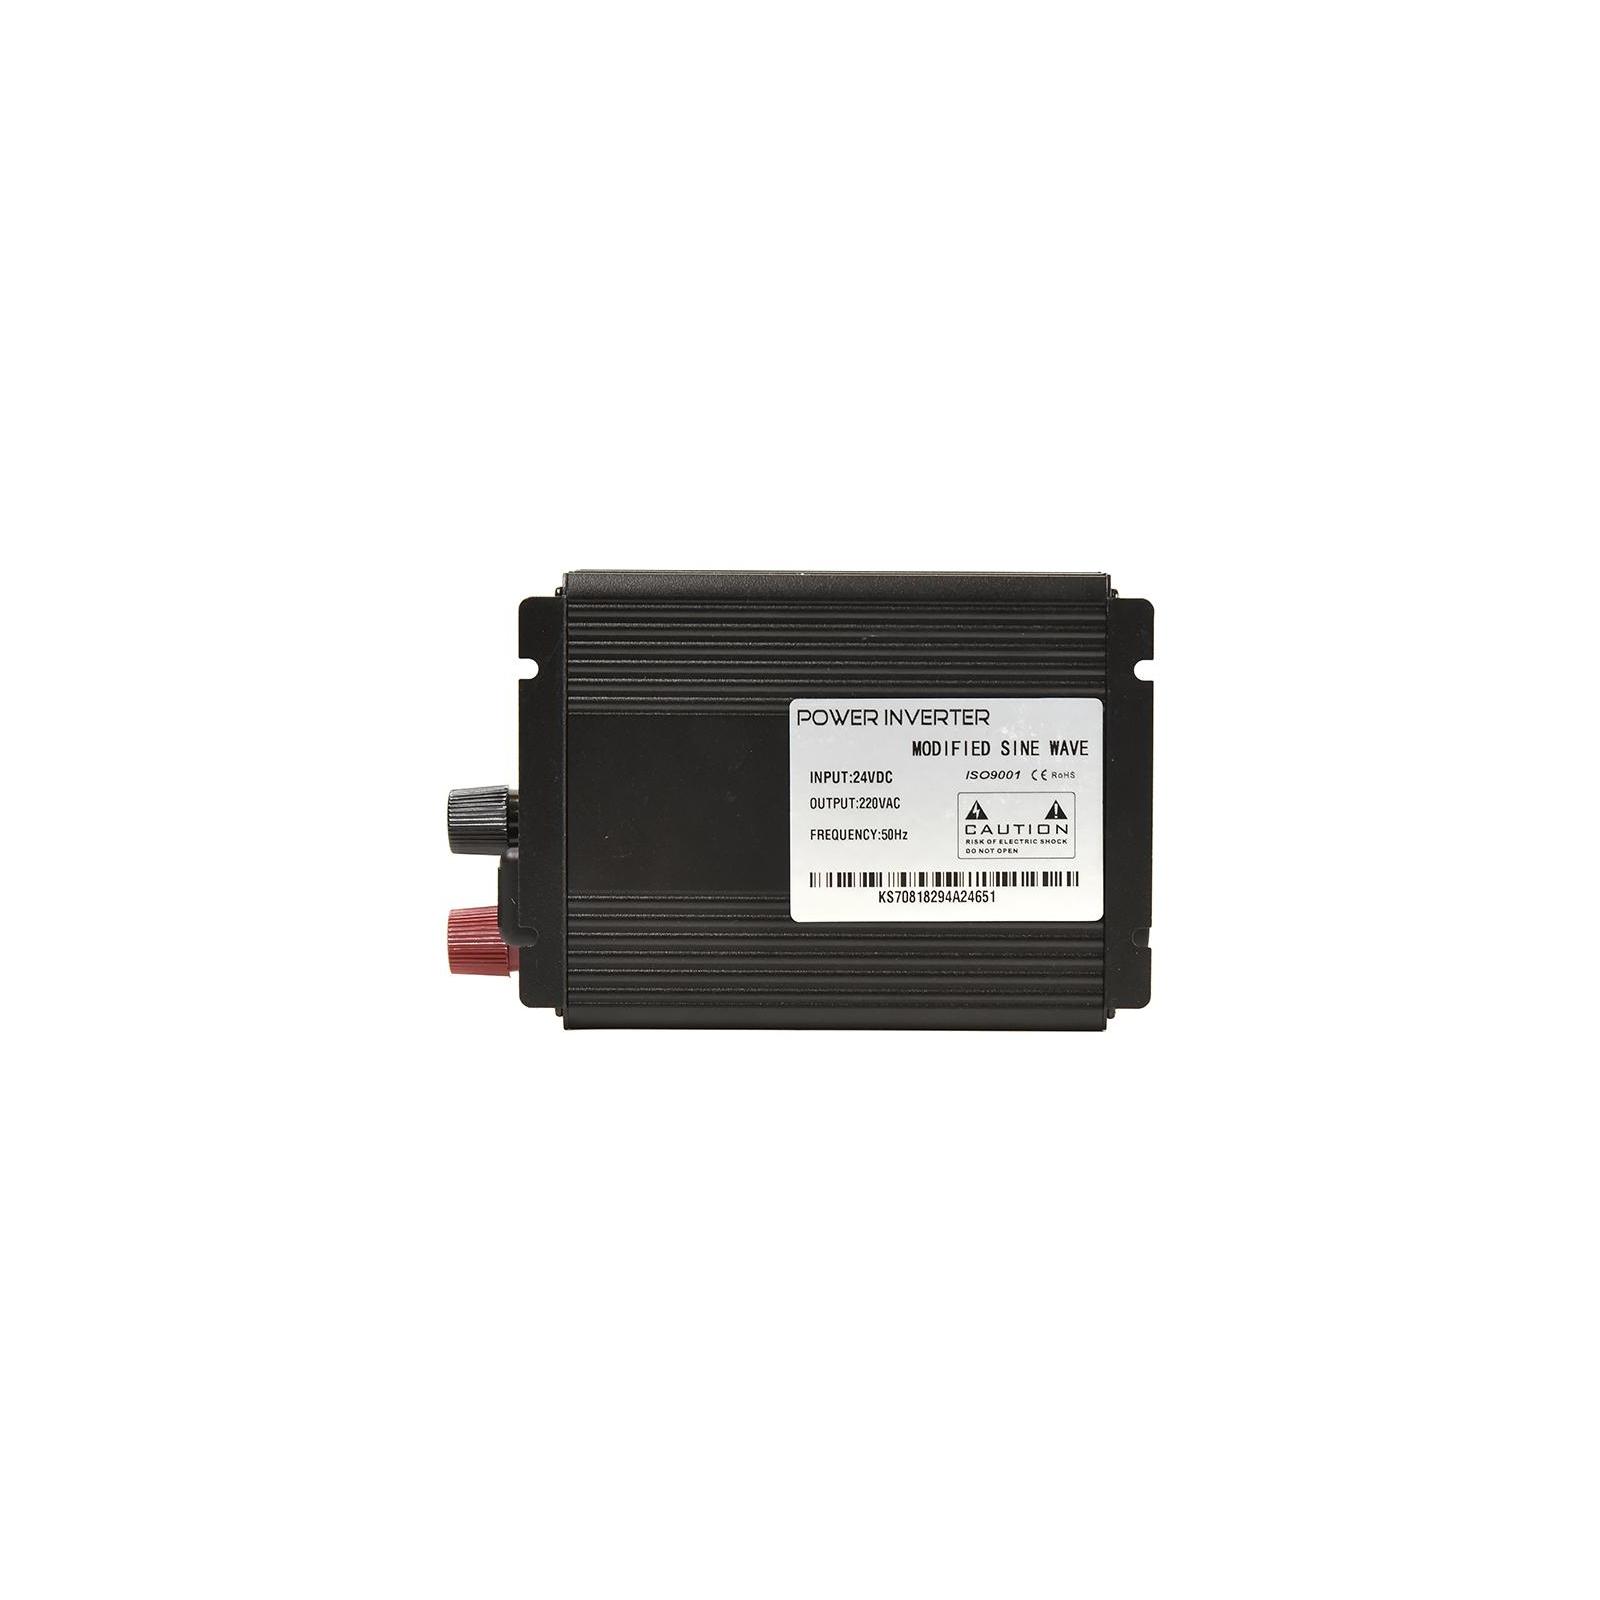 Автомобильный инвертор 24V/220V 300W, USB 5V 1A, HYM300-242 PowerPlant (KD00MS0002) изображение 3